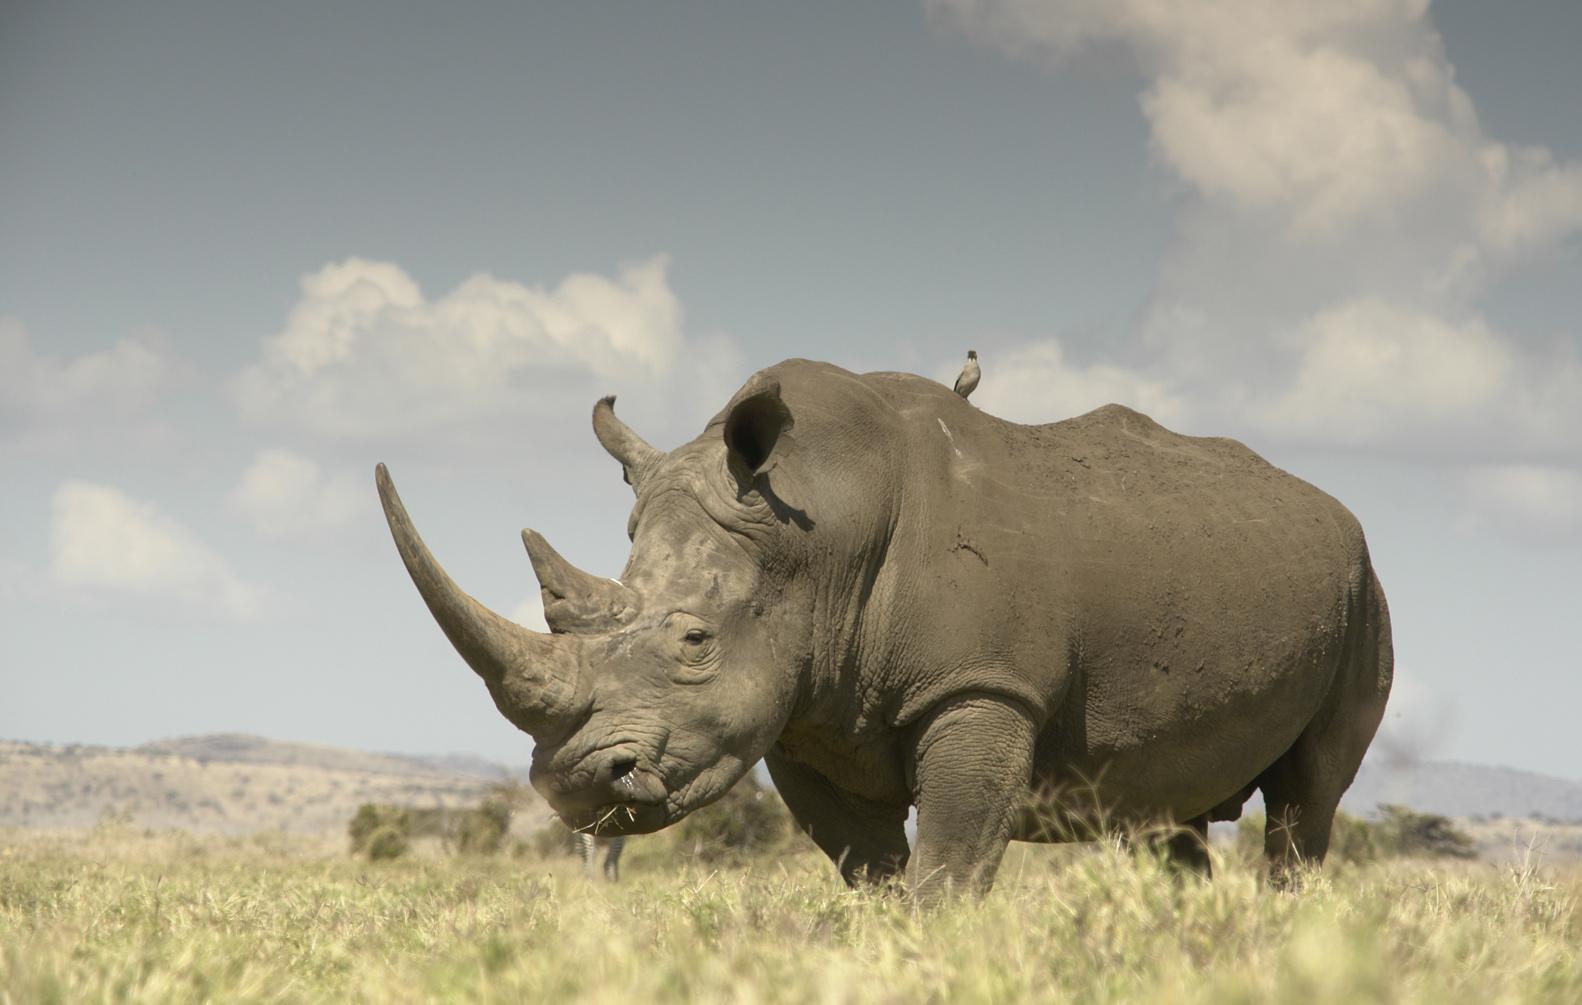 Drawn rhino battle For Kenya's Fight for Kenya's